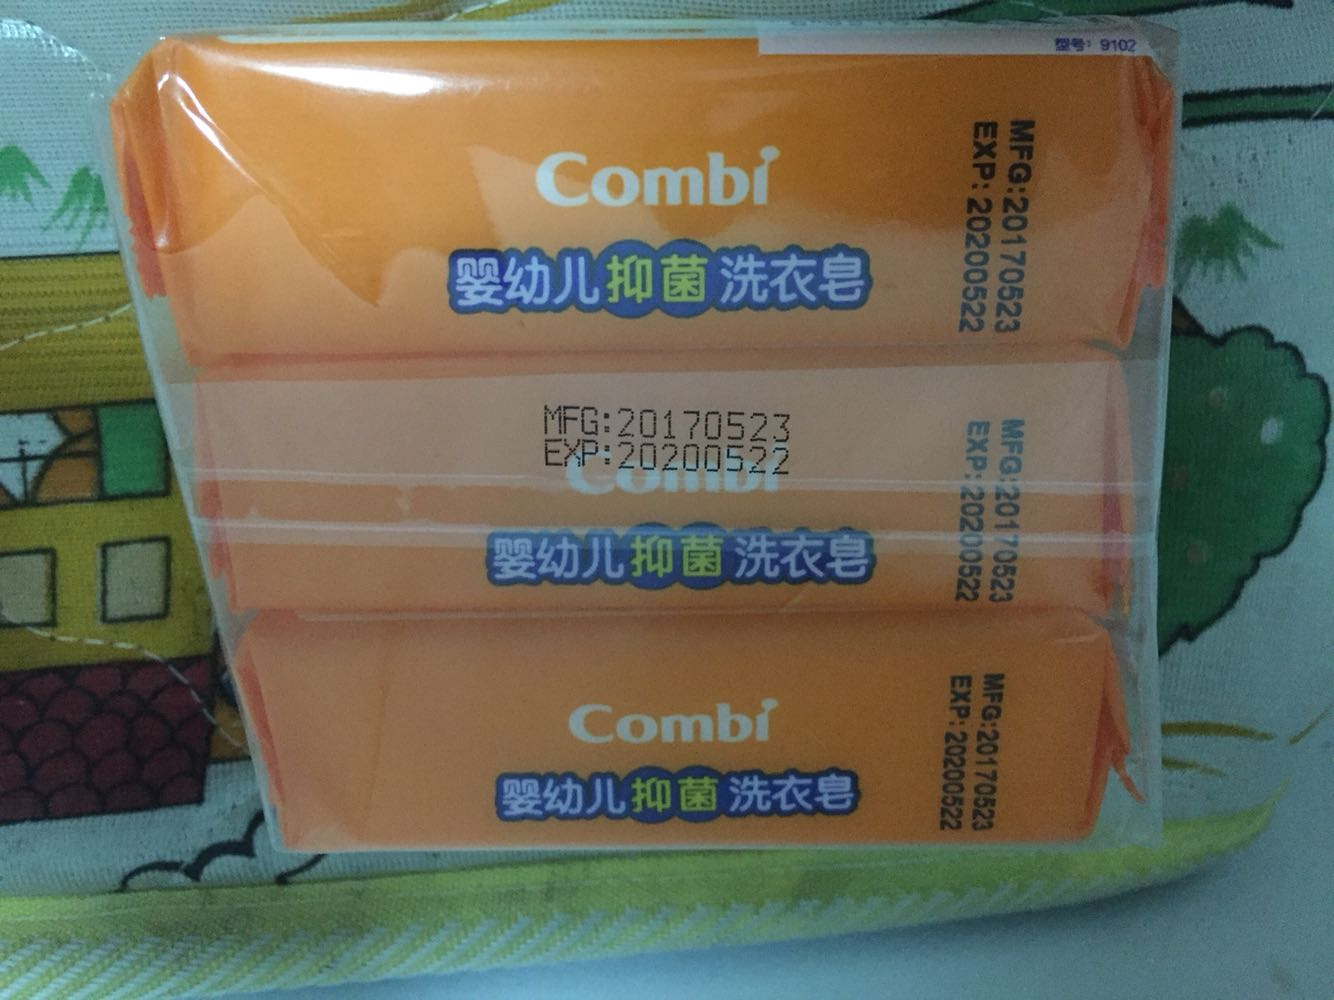 balensiaga 00929192 buy